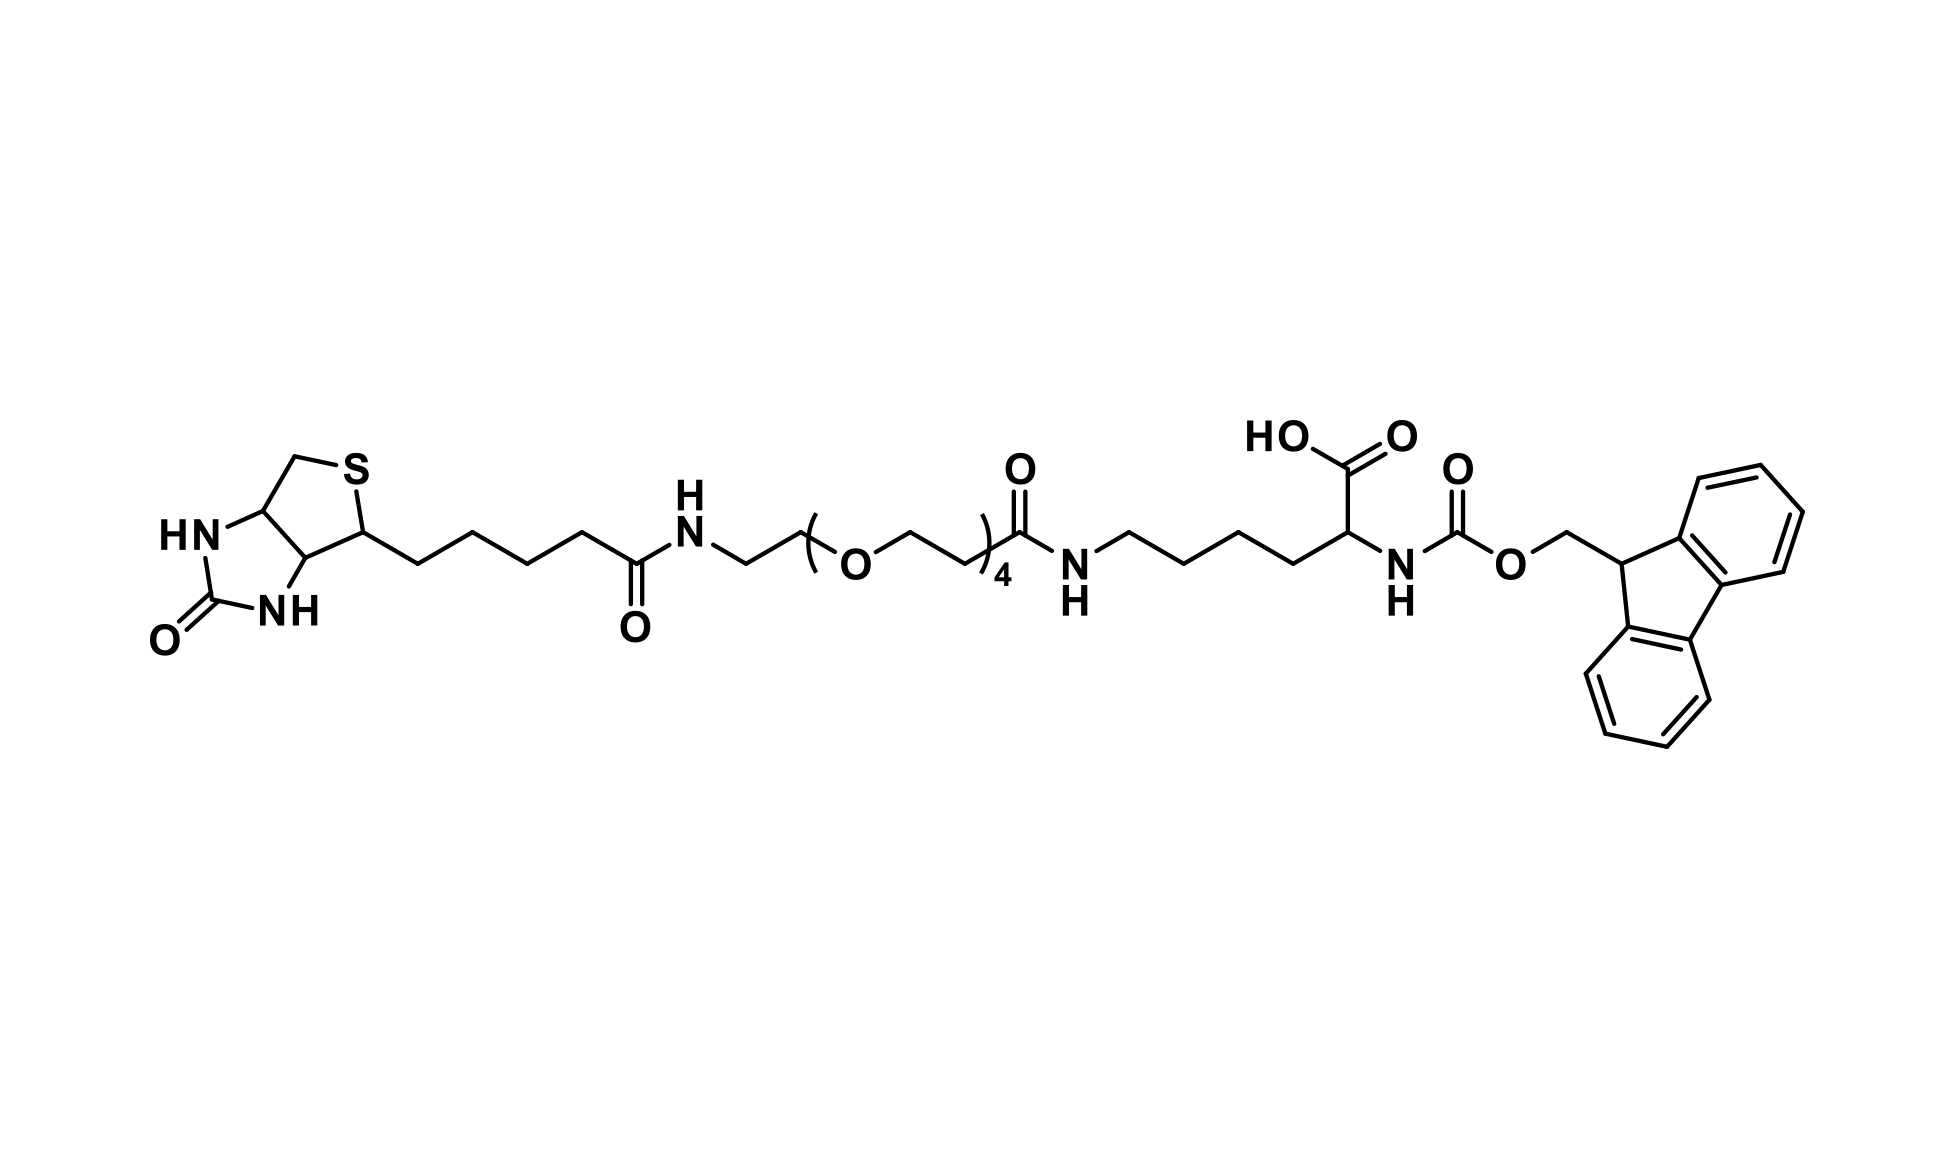 Fmoc-N-Lys-(dPEG®₄-biotin)-OH-(acid)